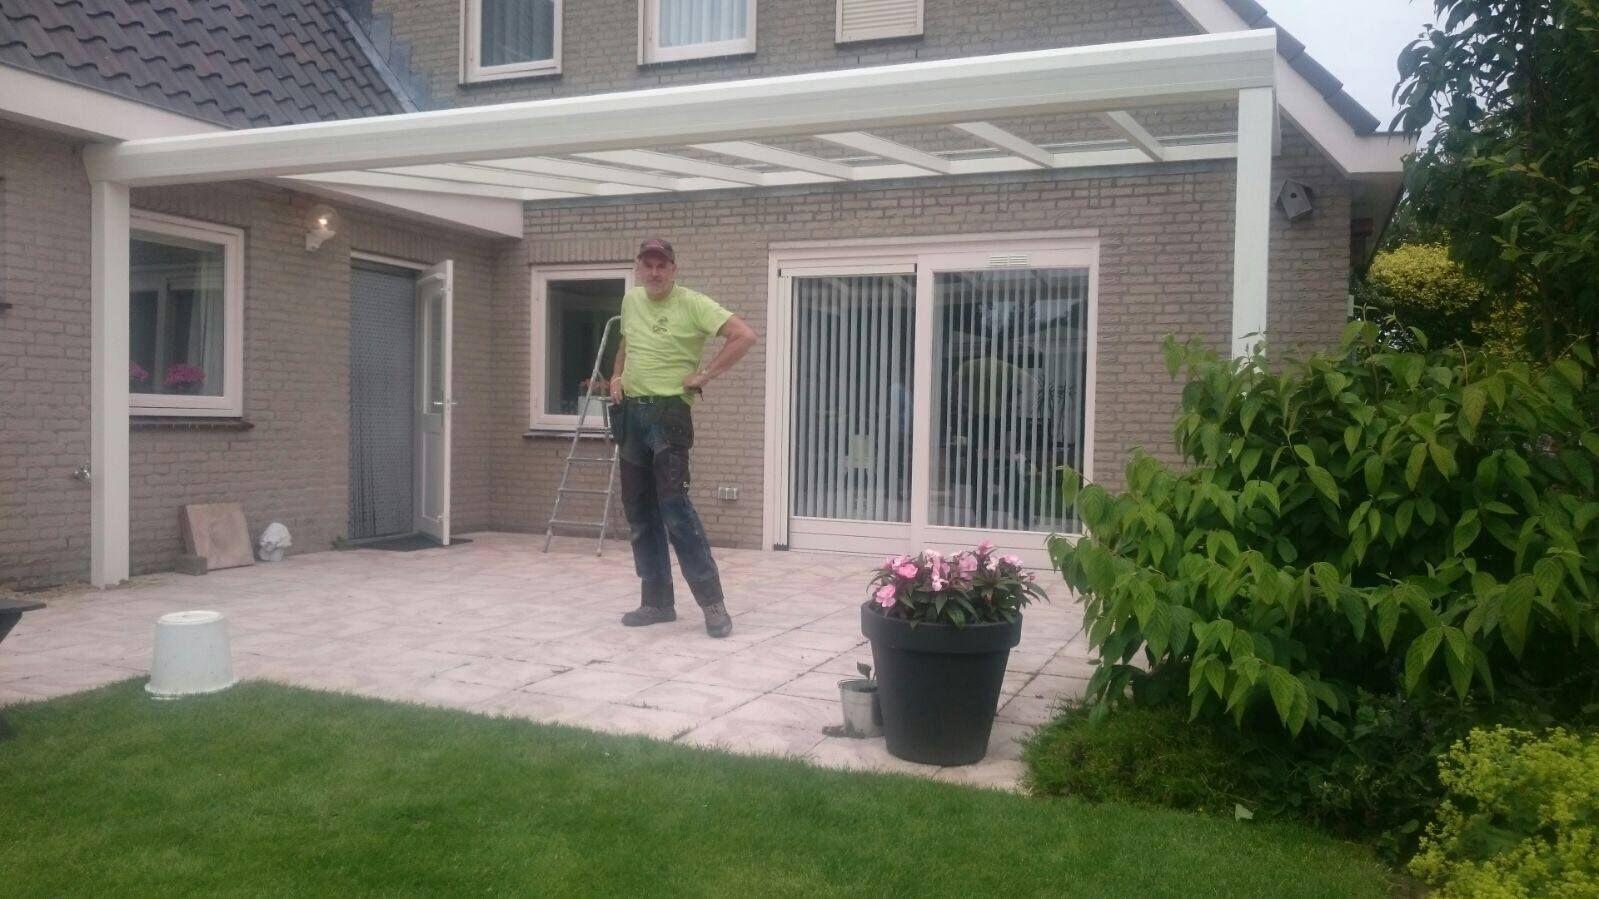 Veranda Aluxe Topline geplaatst in Ravenstein.  #veranda #aluxe #aluxetopline #topline #verandasproducten #tuin #garden #gardering #placeforfamily #ravenstein